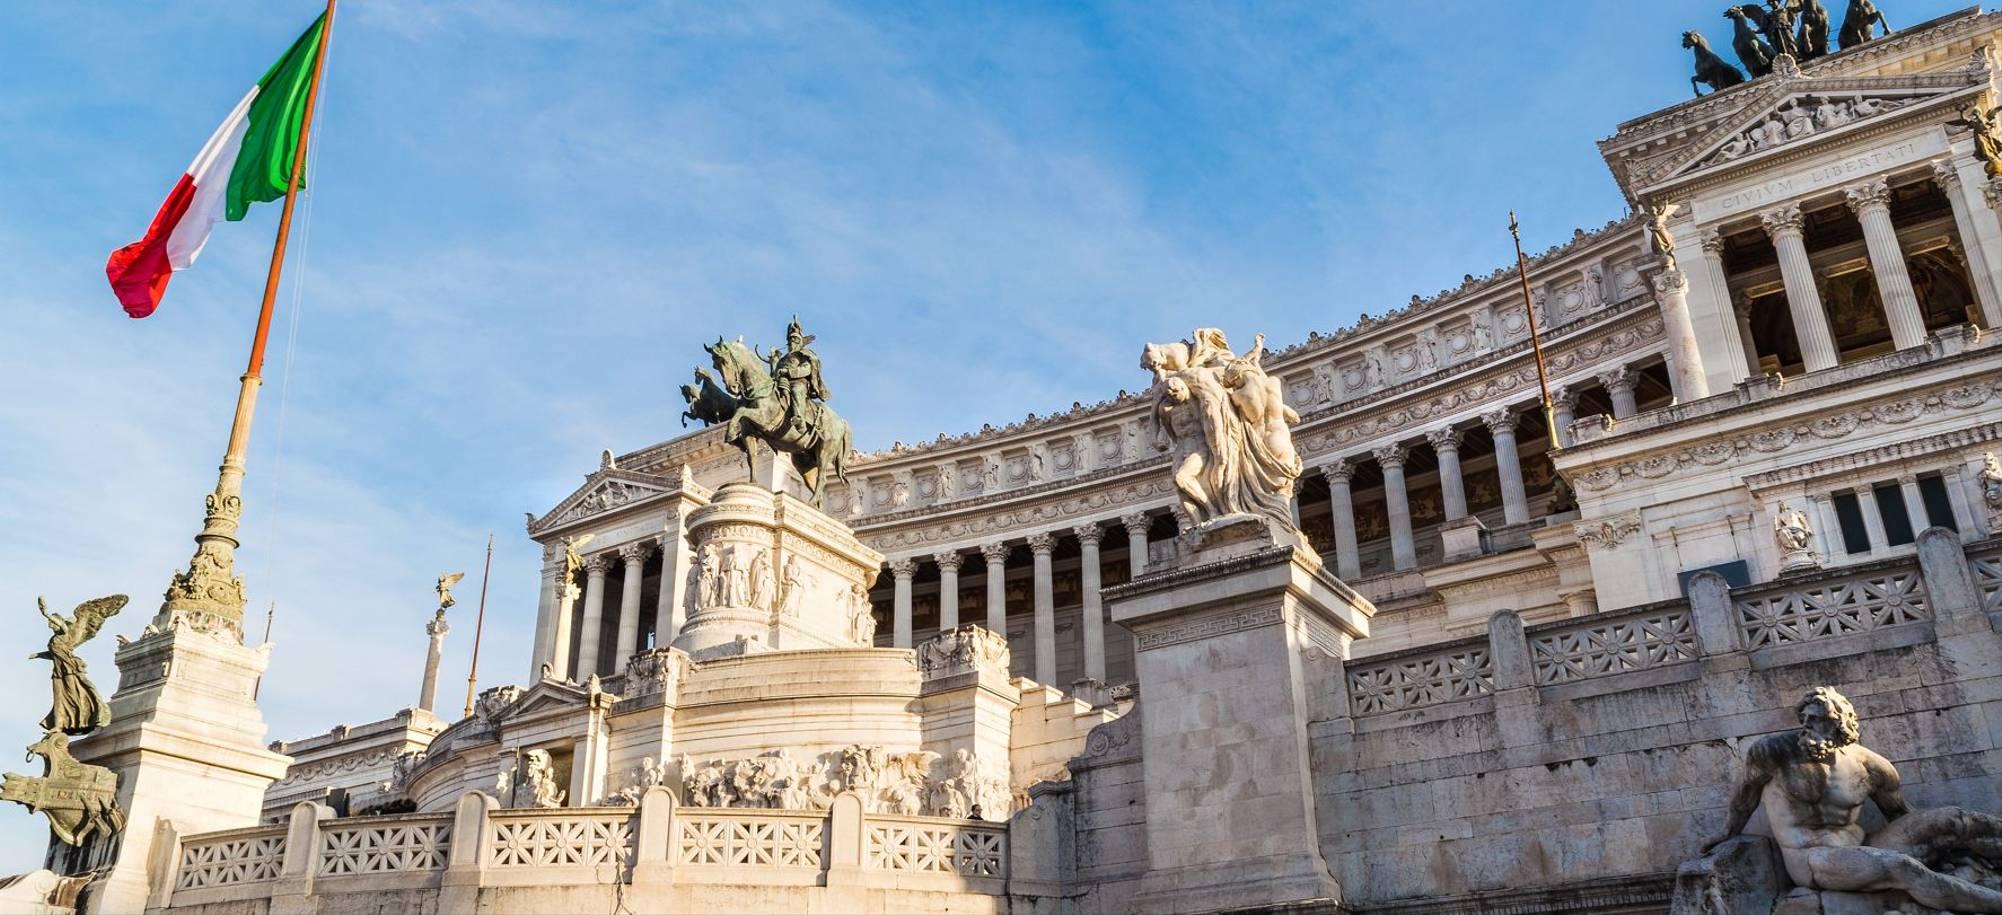 Rome   Vittorio Emanuele II Monument   Itinerary Desktop